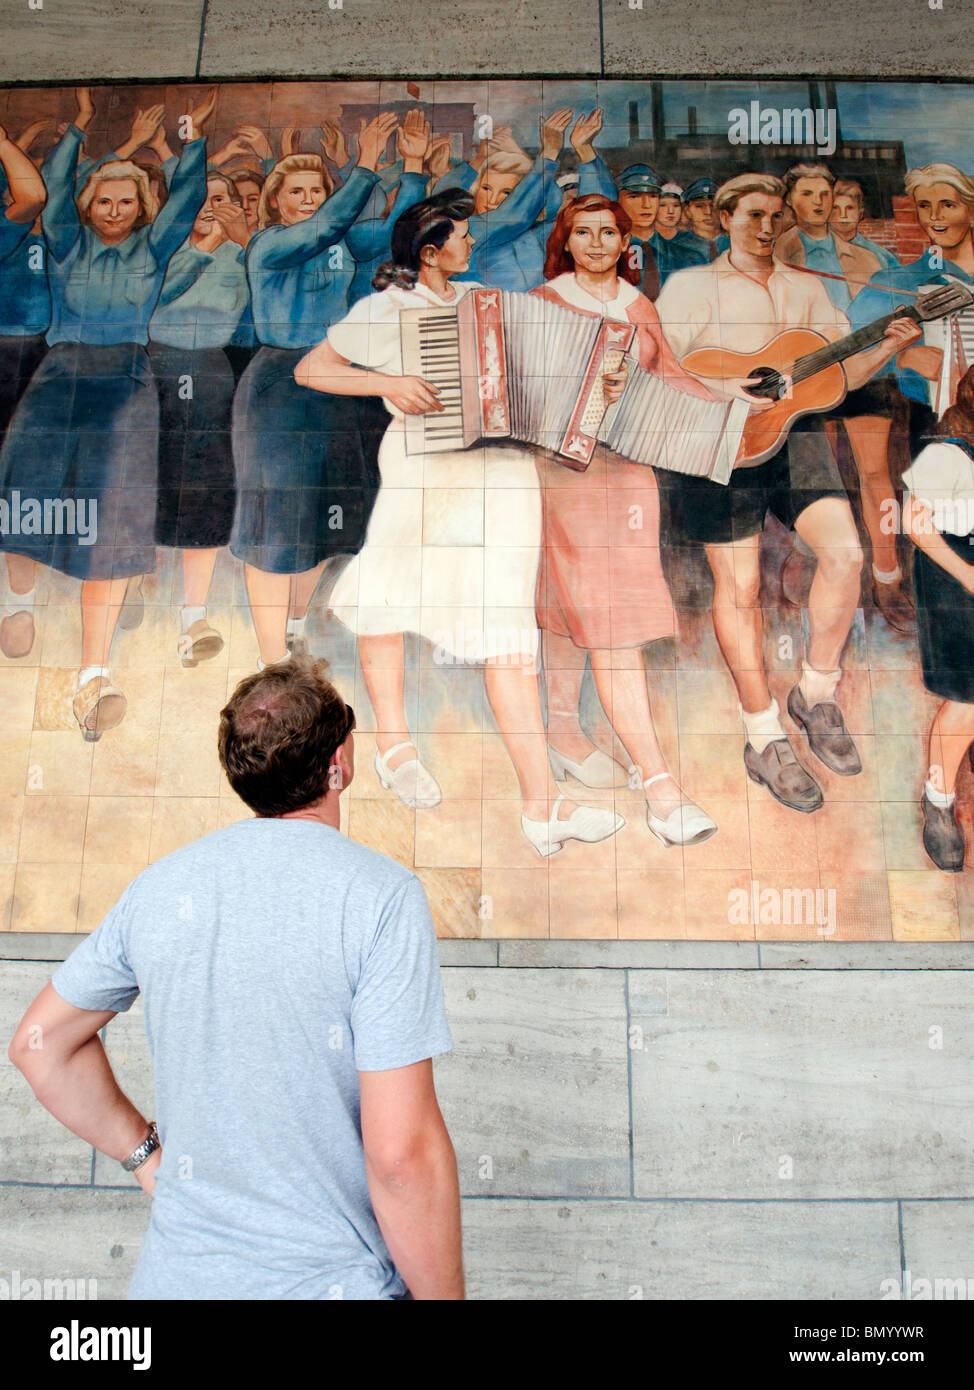 East German era socialist propaganda murals of happy workers on wall of German Finance Ministry building in Berlin - Stock Image